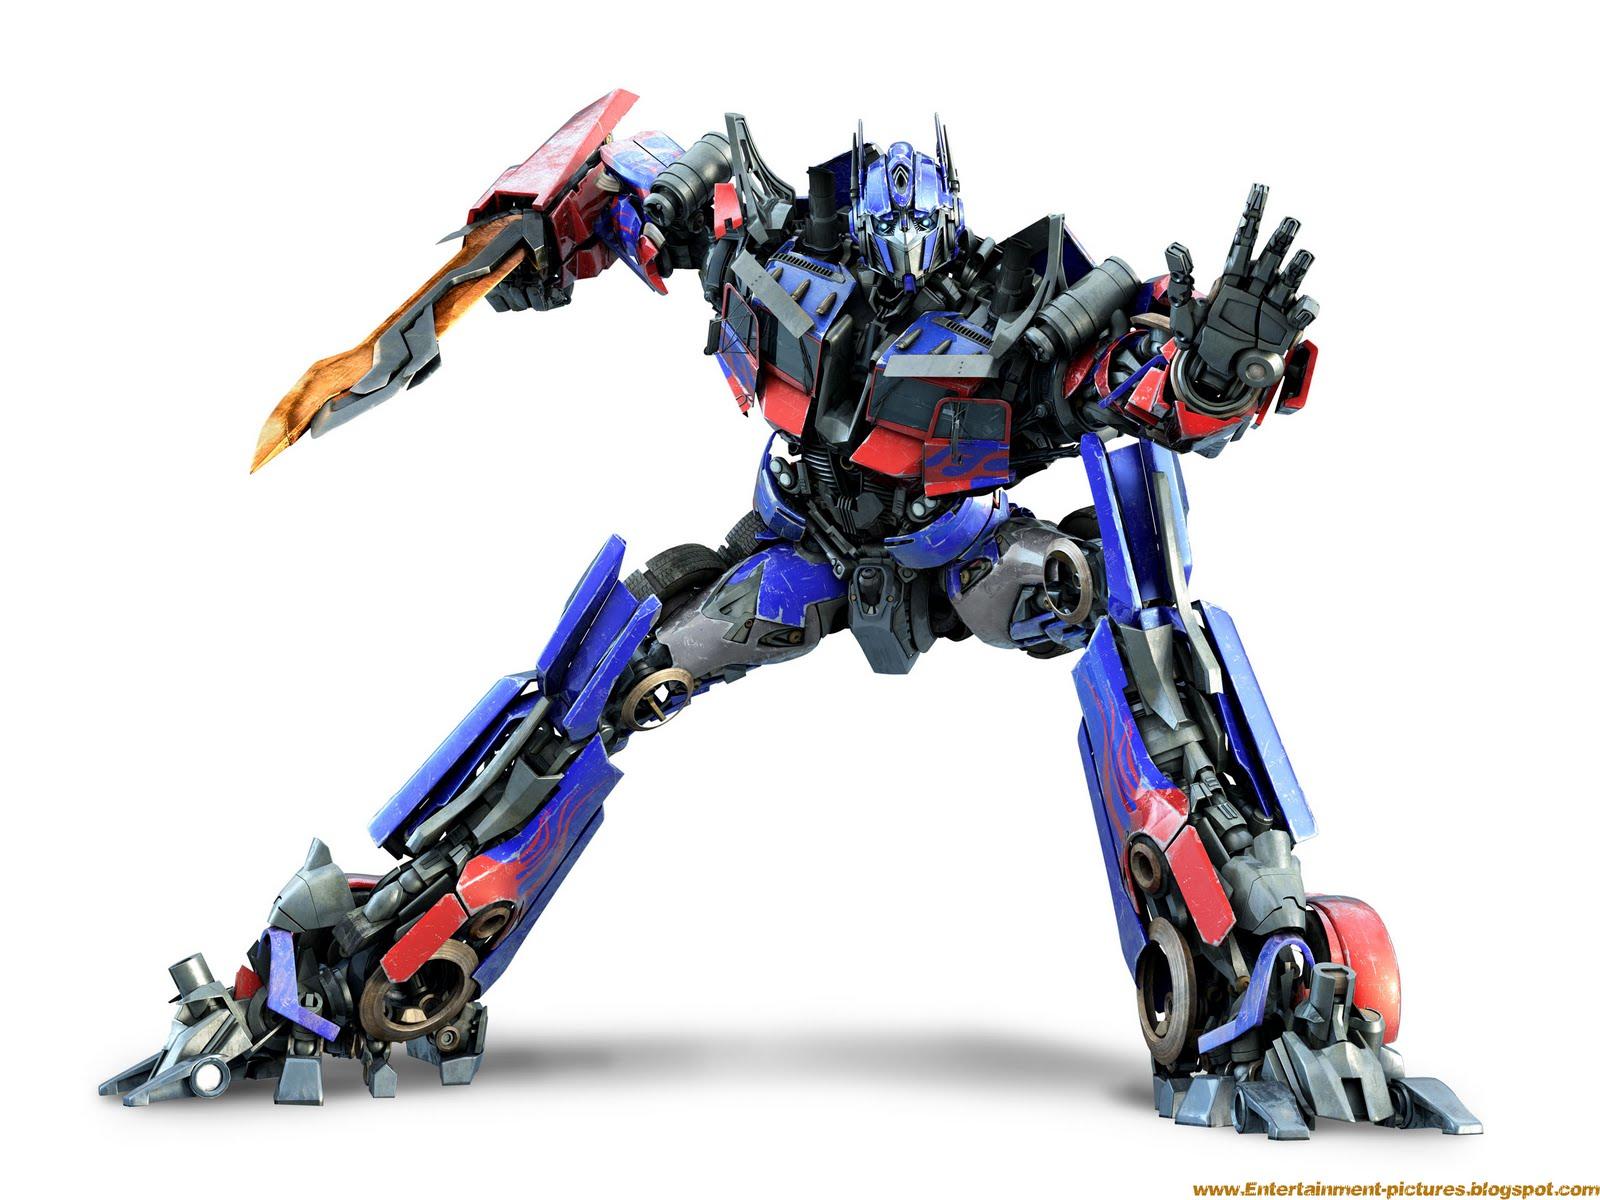 http://3.bp.blogspot.com/-lg1Hv-KbZ7M/ThPKgNDwf5I/AAAAAAAAD60/j9jyS5210ns/s1600/transformers-optimus-prime.jpg